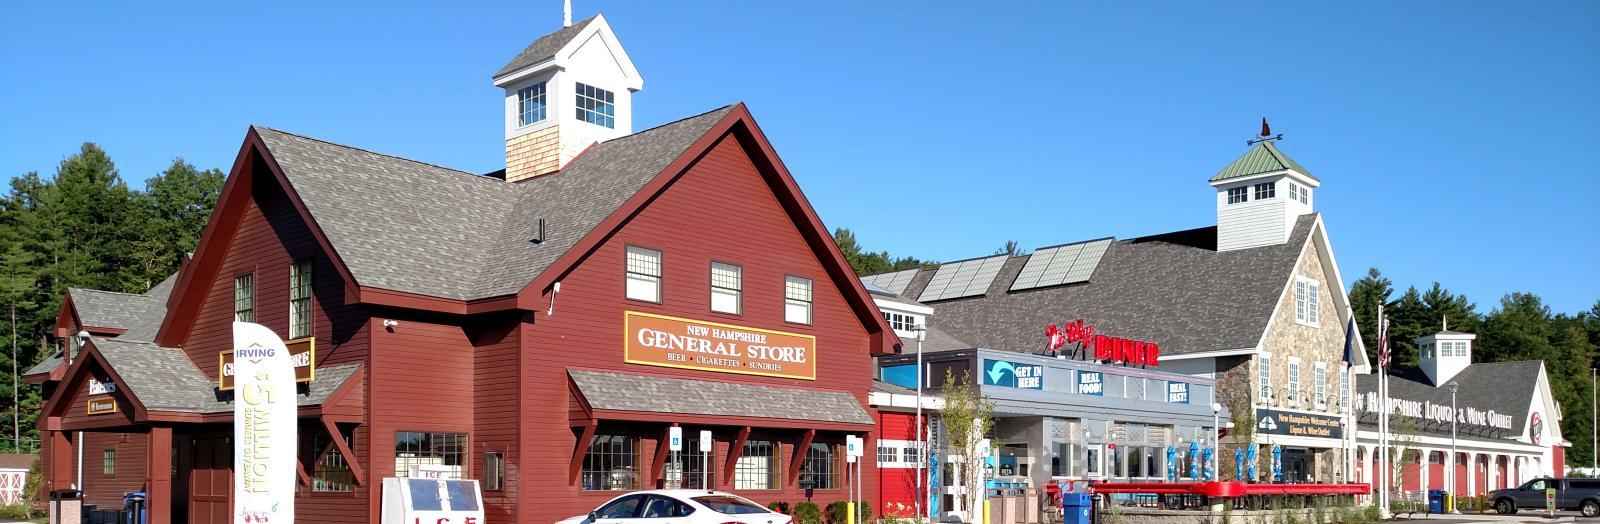 Hooksett Southbound Visitor Center And Liquor Store